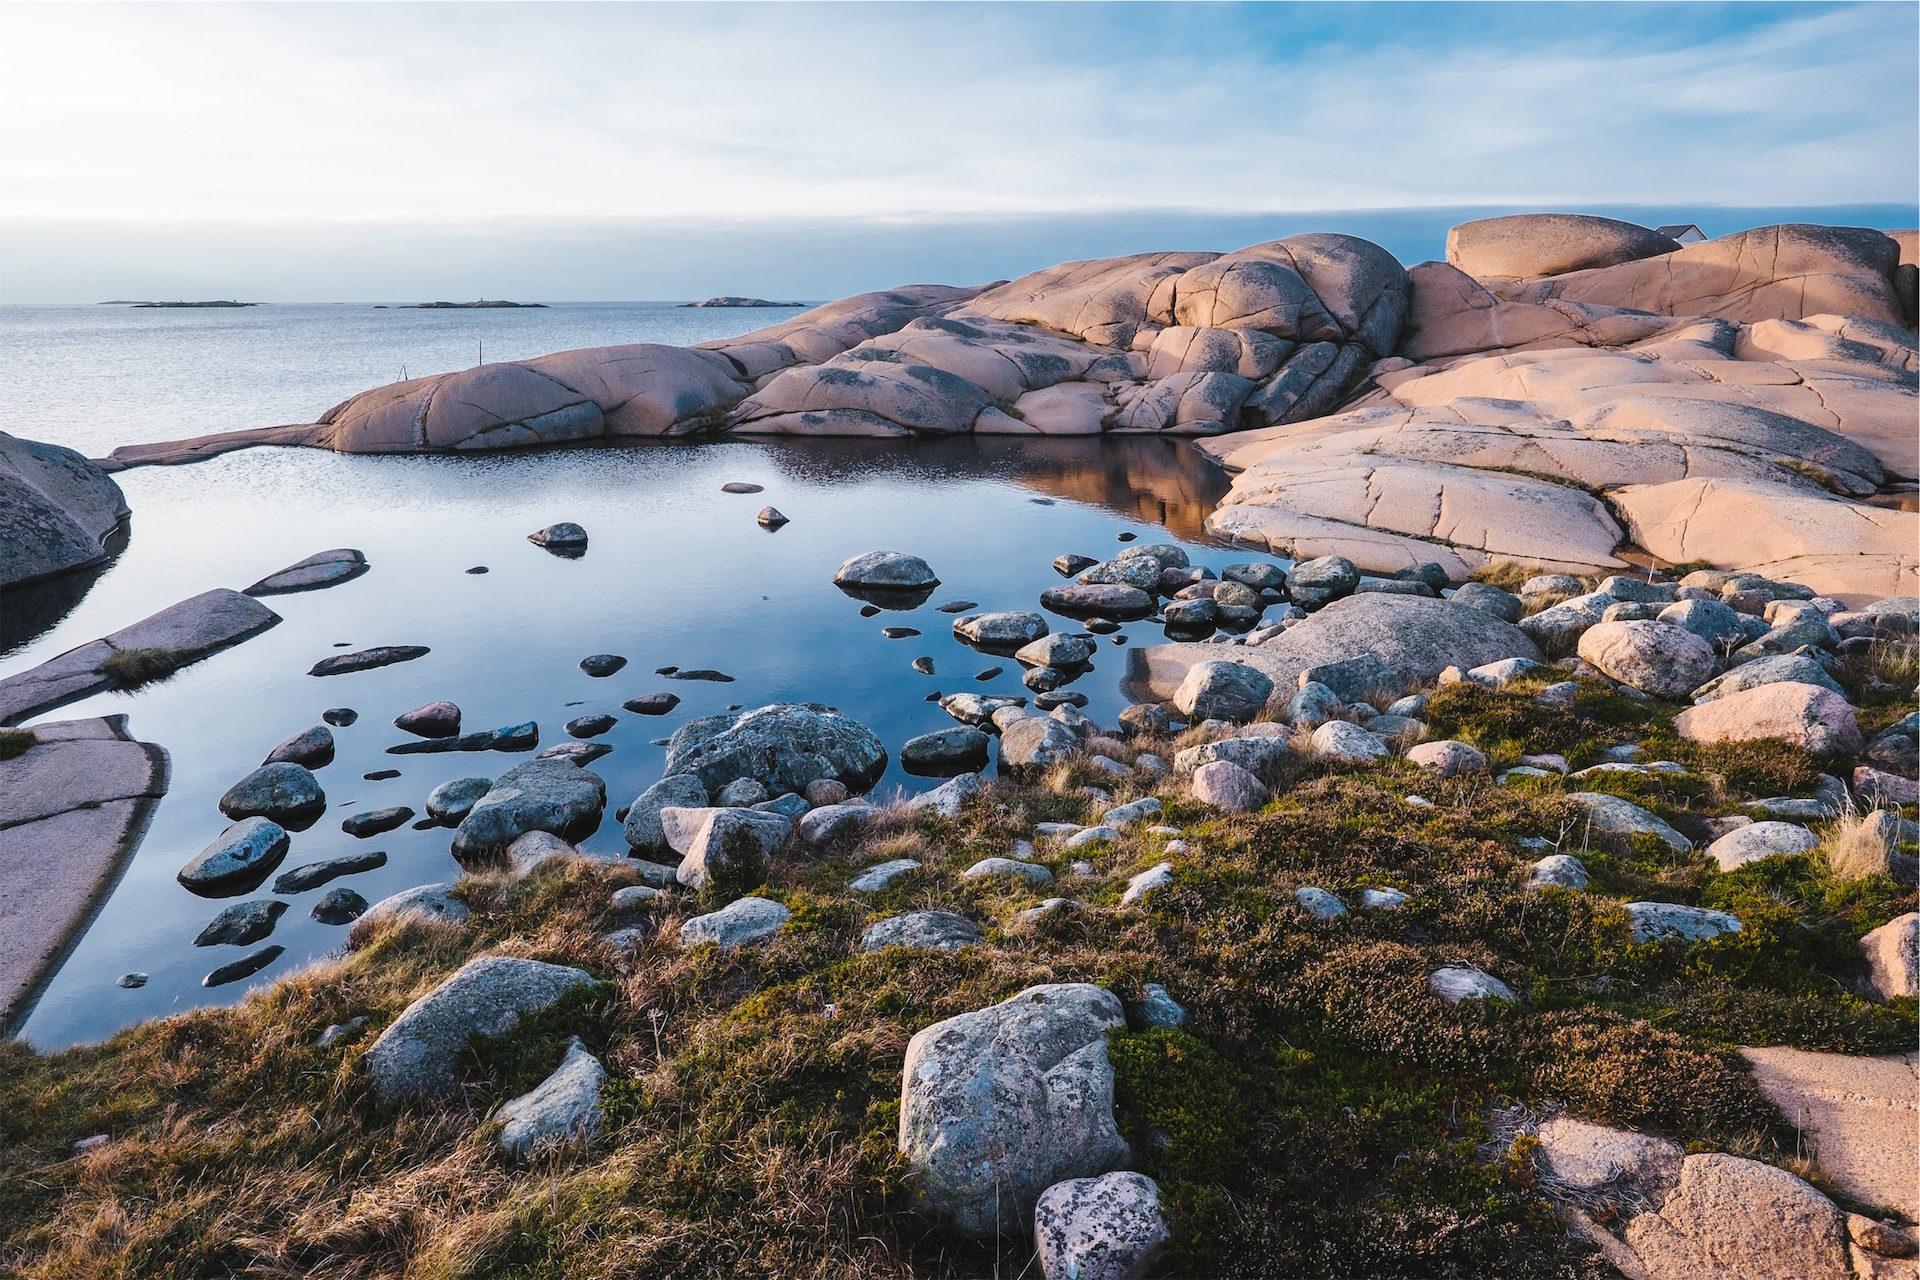 Океан, камни, берег, Море, Небо - Обои HD - Профессор falken.com